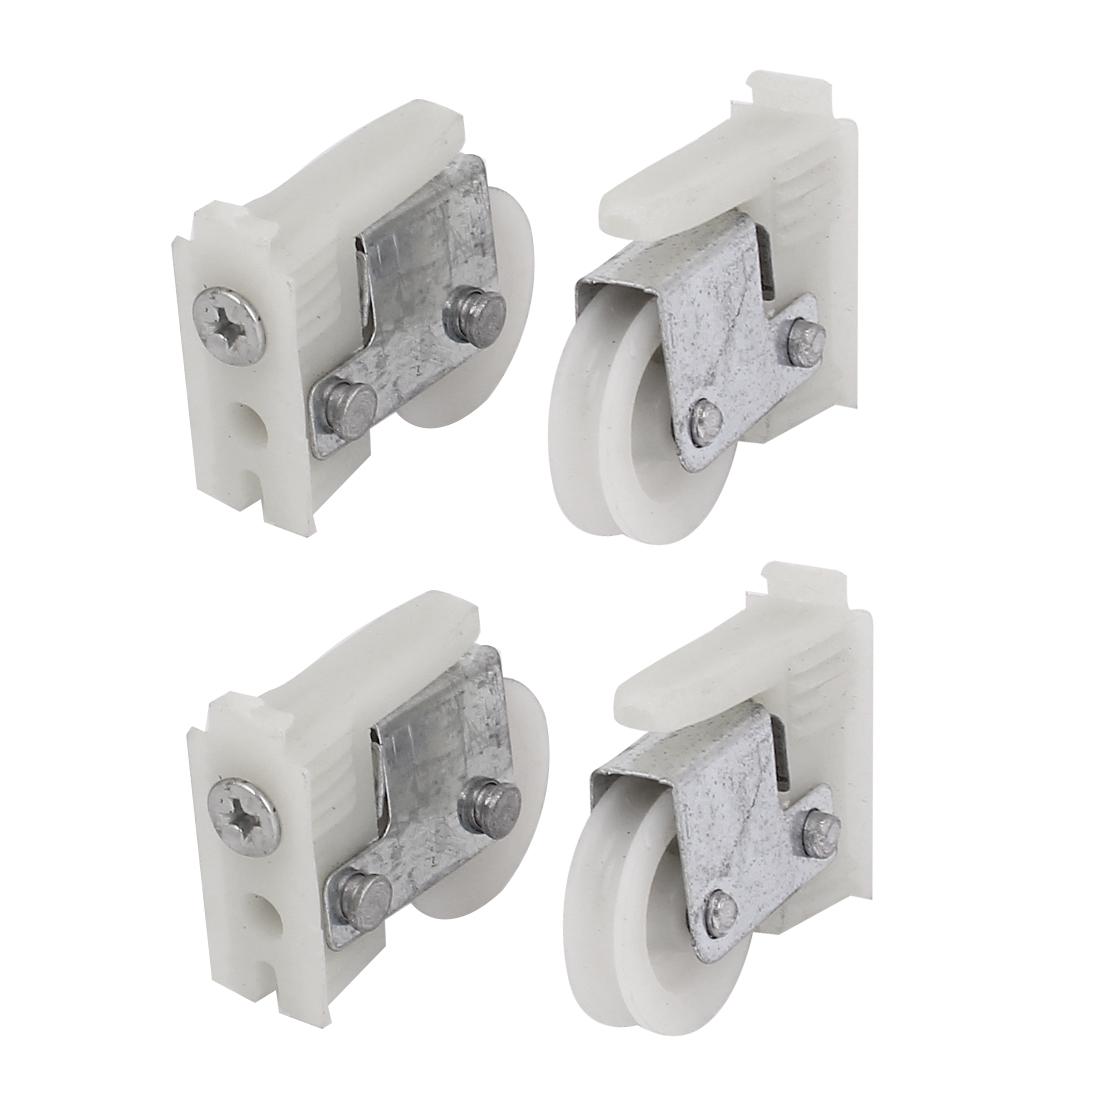 4pcs 17.5mm Dia. Wheel 828 Double Roller Door Window Sash Pulley White Silver Tone